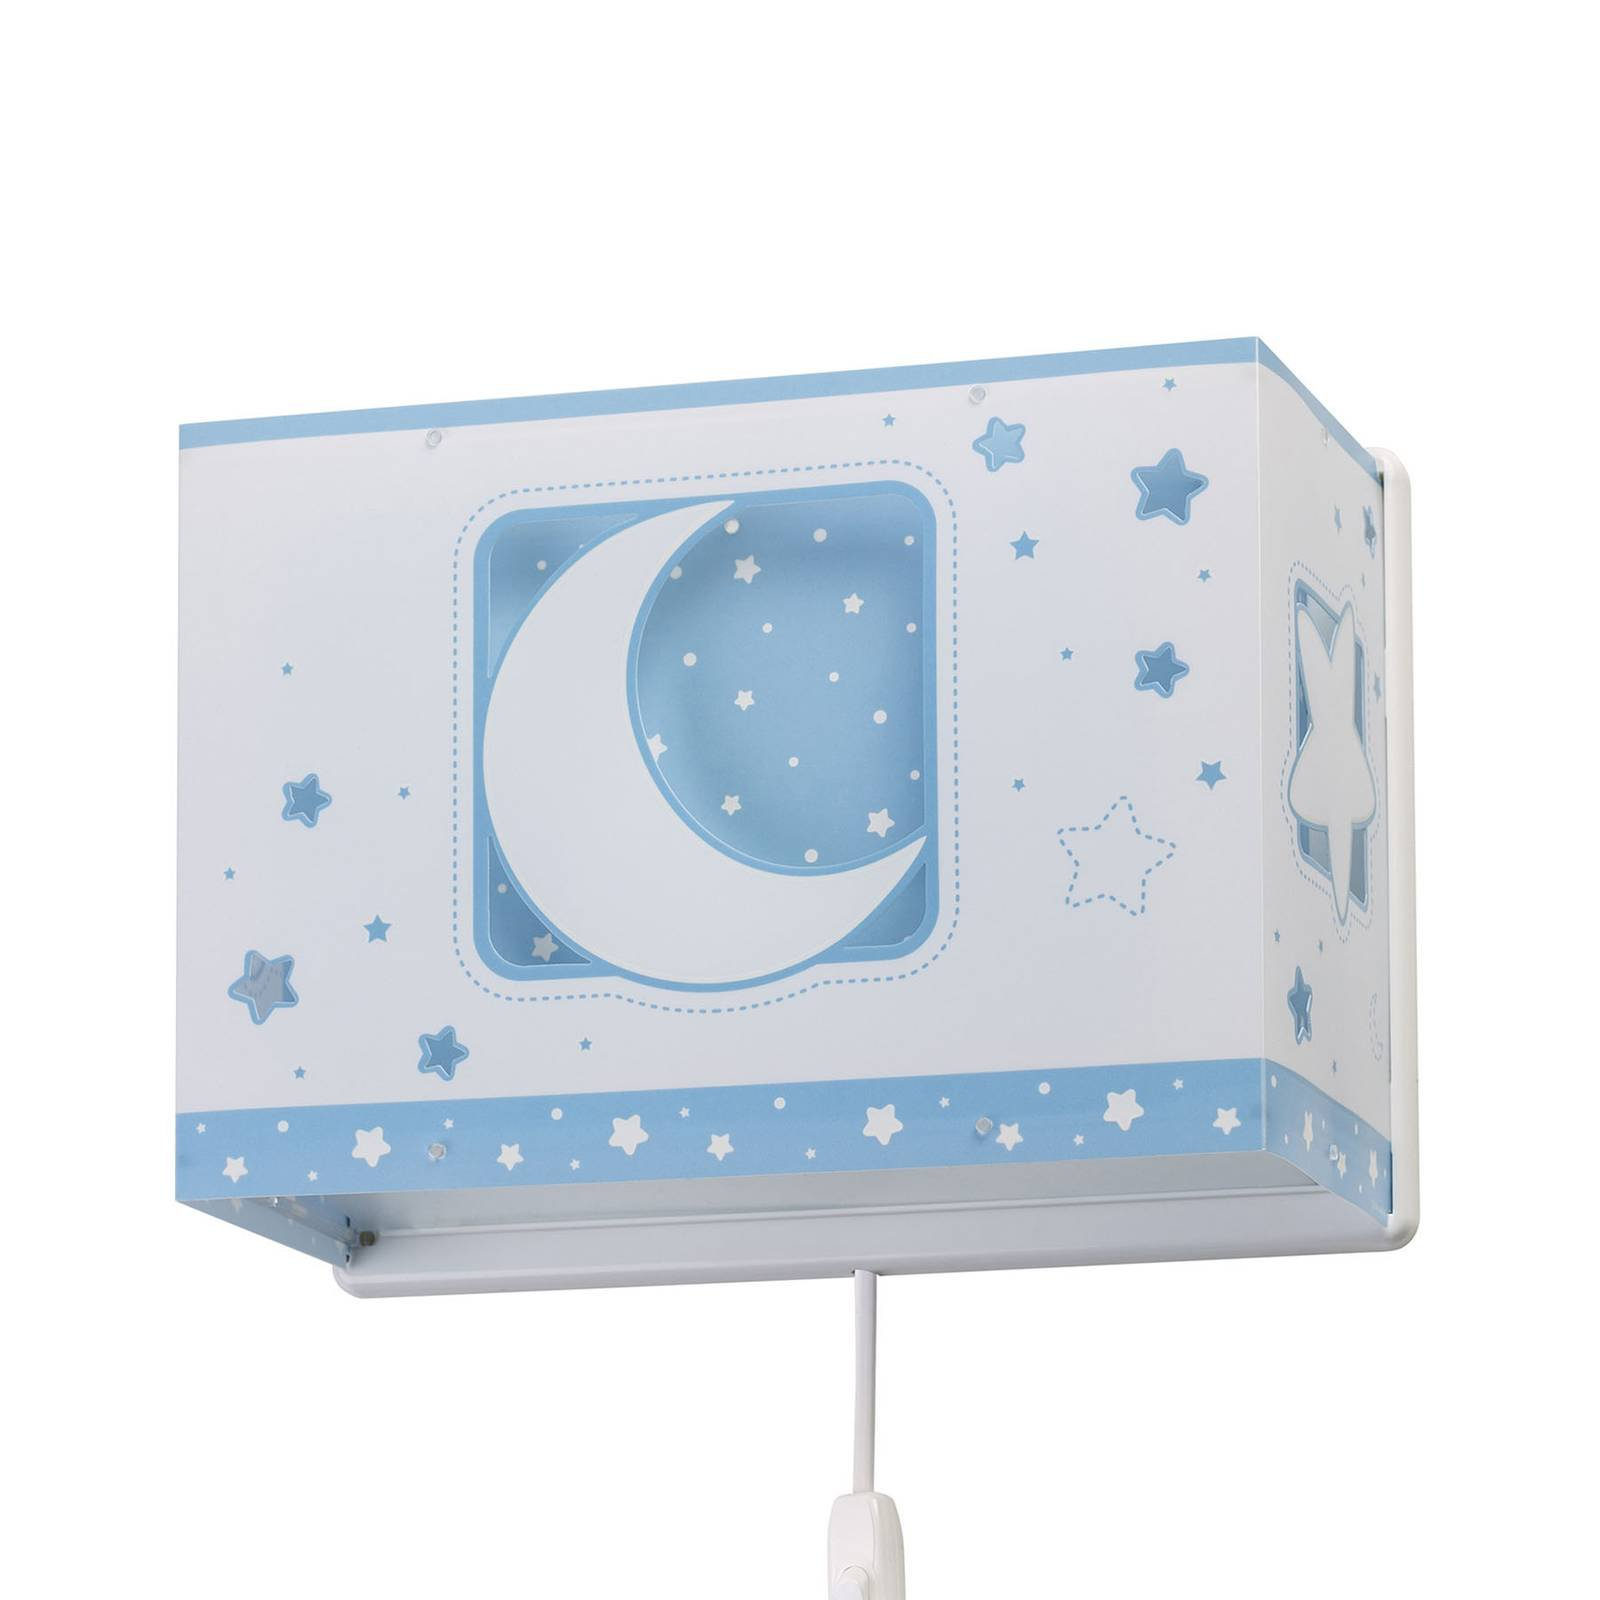 Pendellampe til barnerom Moonlight med plugg, blå